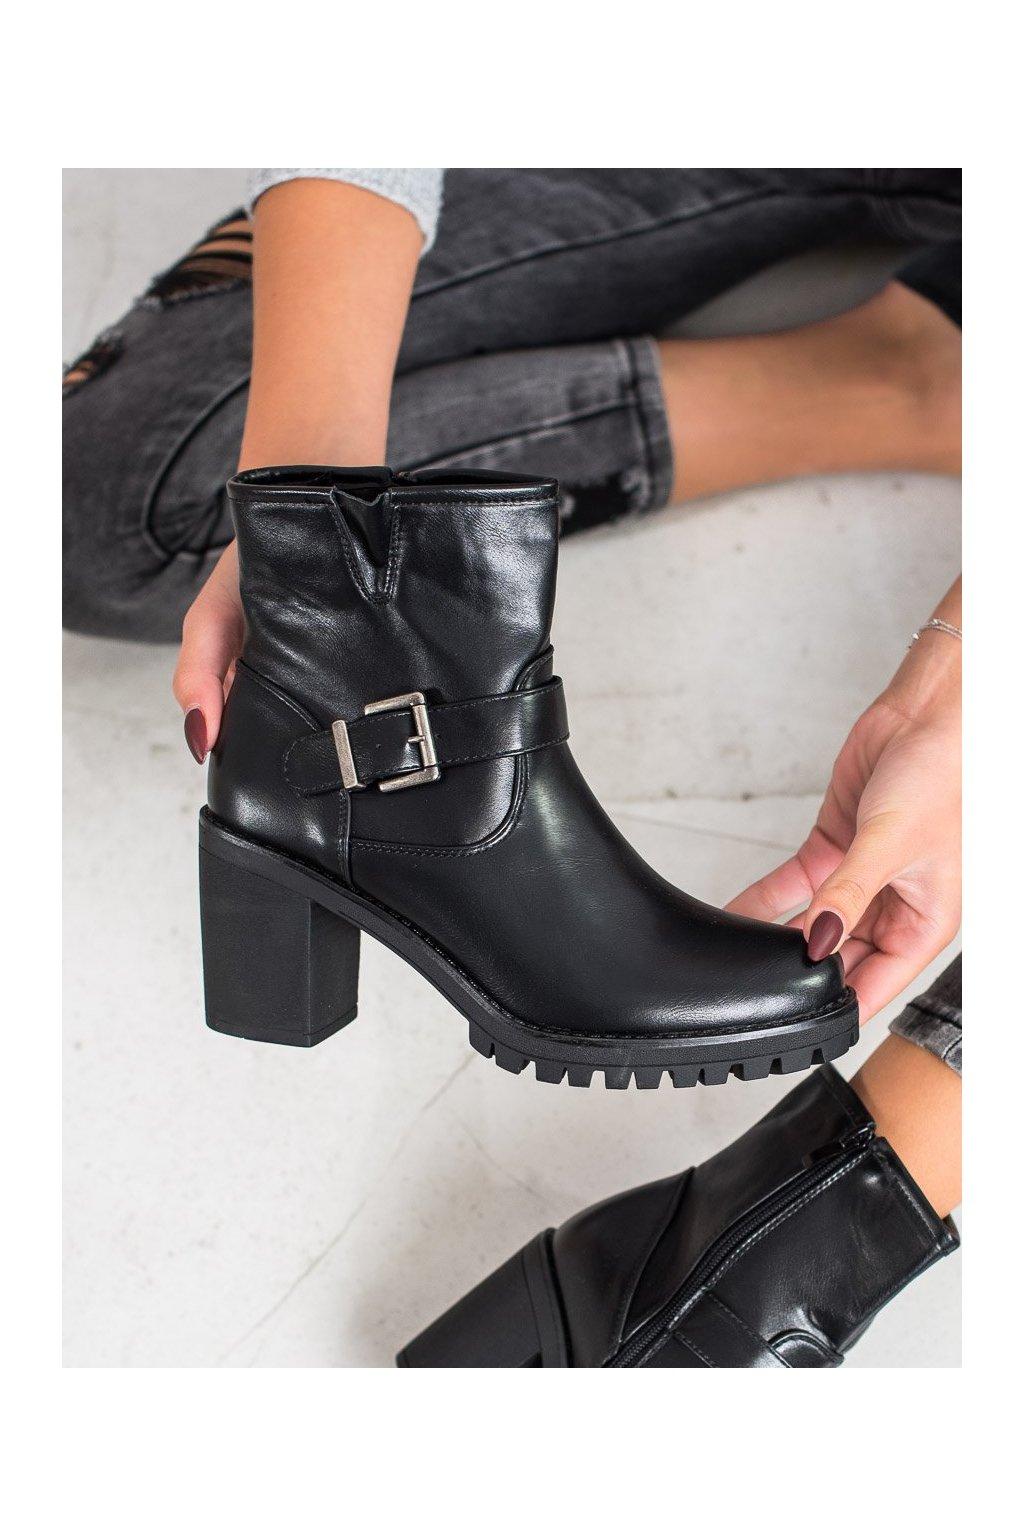 Čierne dámske topánky Marquiz kod E9314B